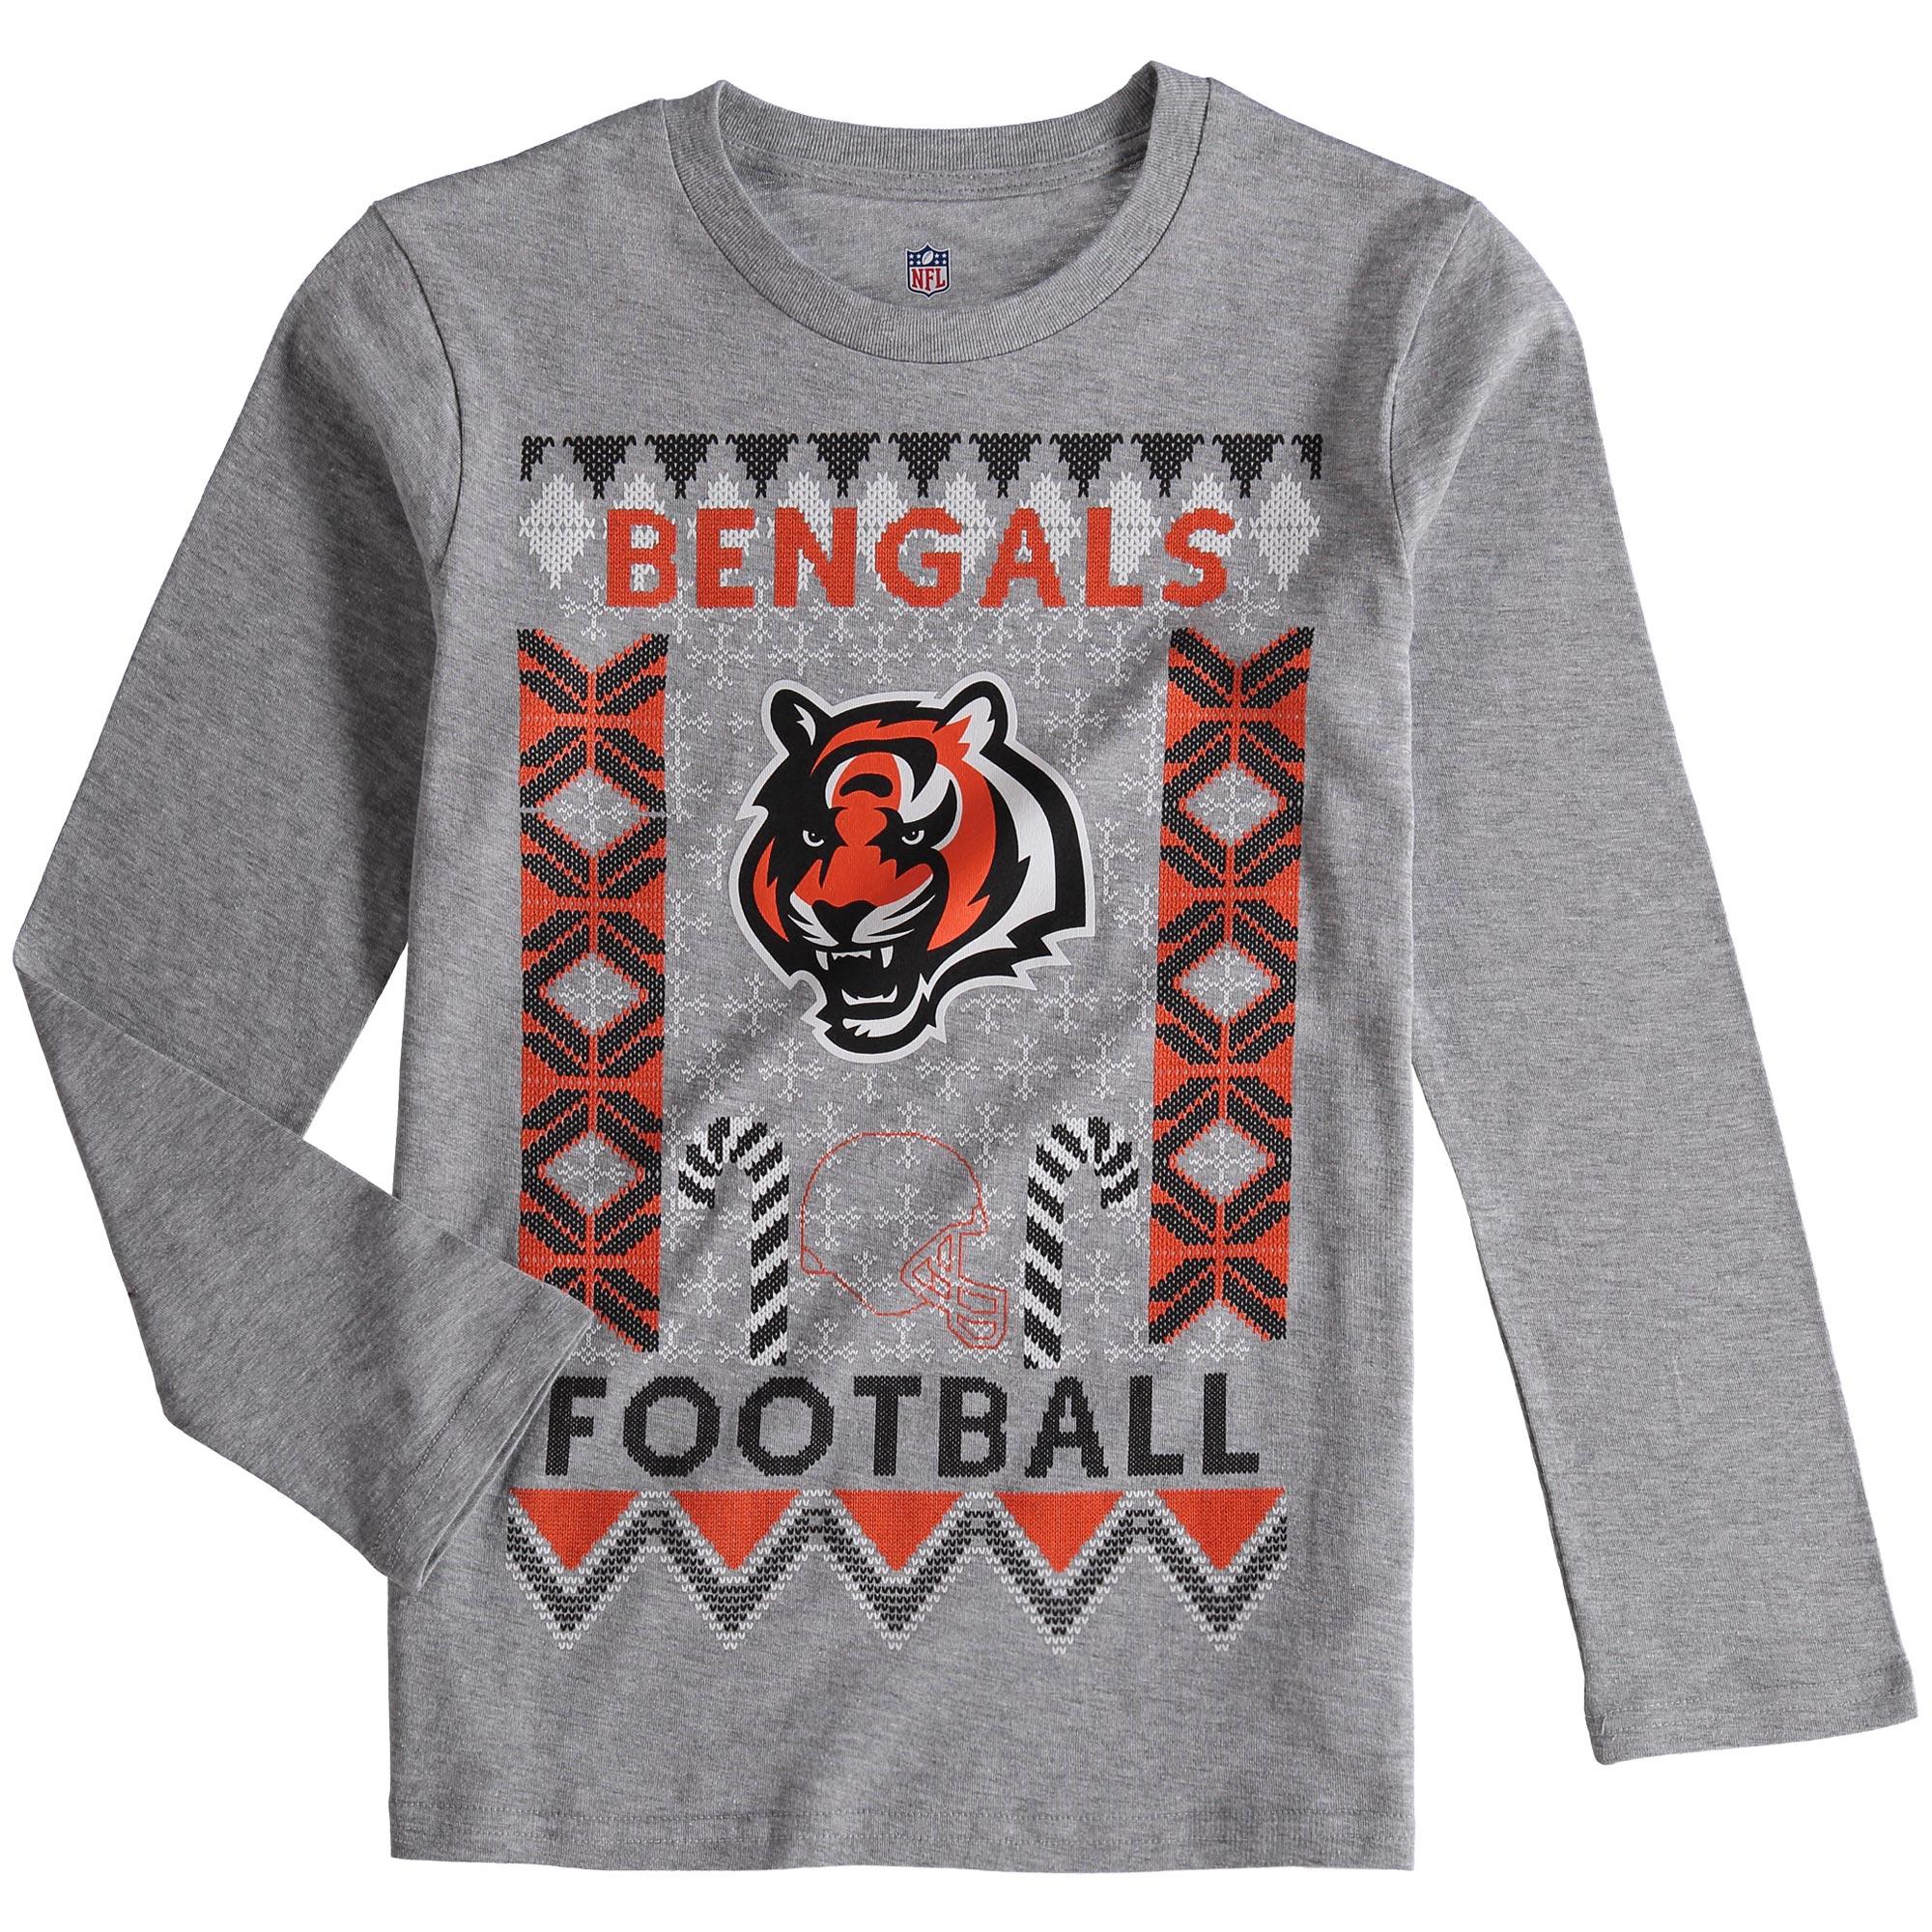 Cincinnati Bengals Youth Blizzard Long Sleeve T-Shirt - Heathered Gray